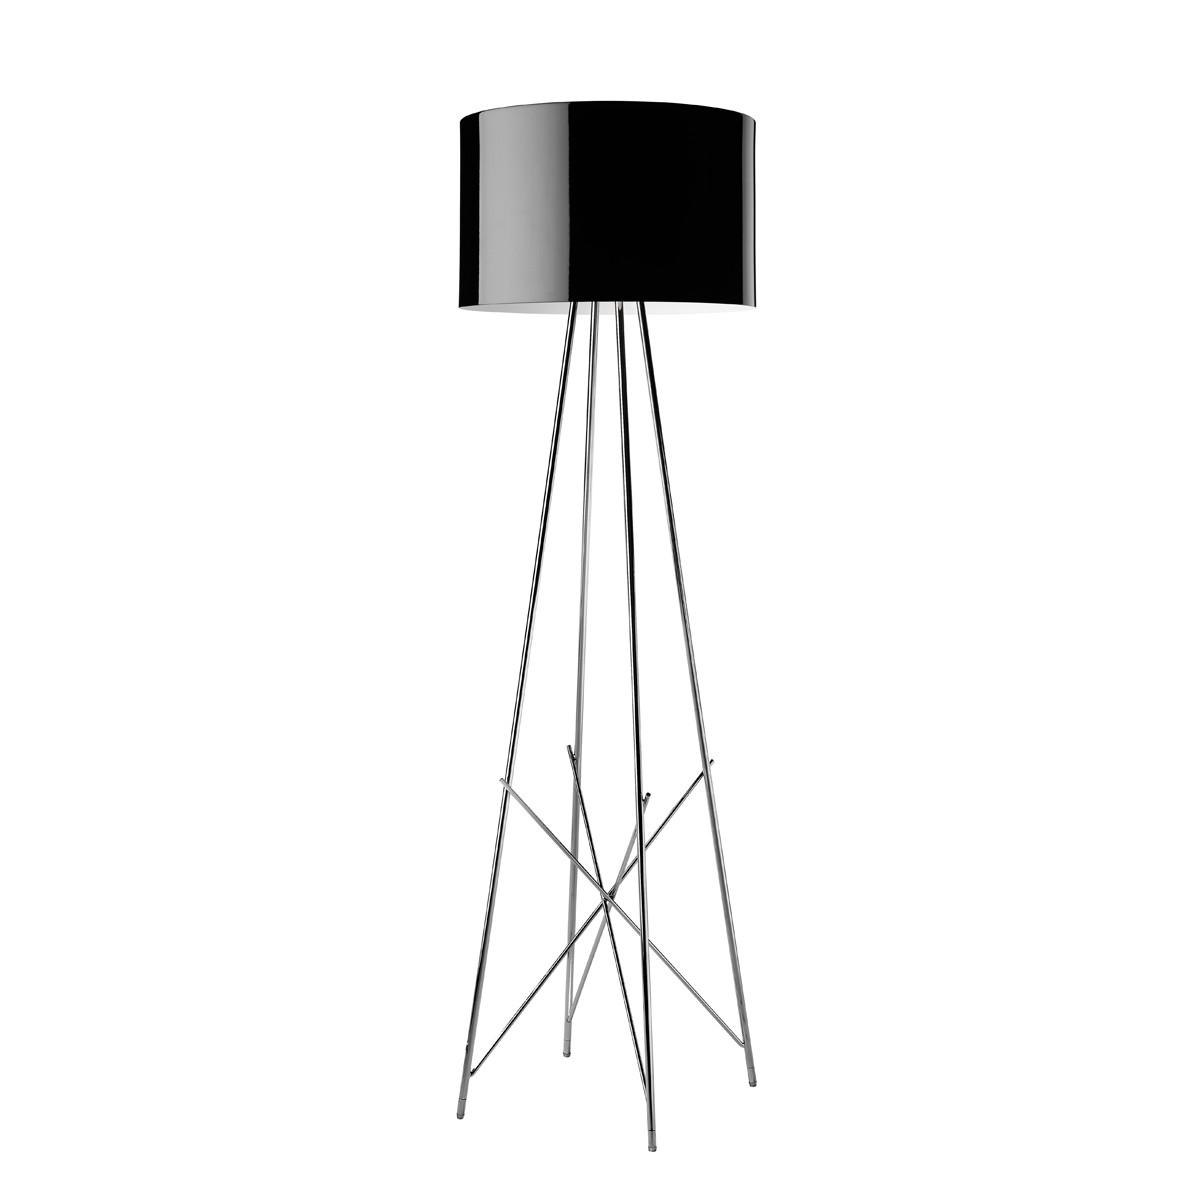 Flos Ray F Stehleuchte, F1, Höhe: 128 cm, Alu schwarz